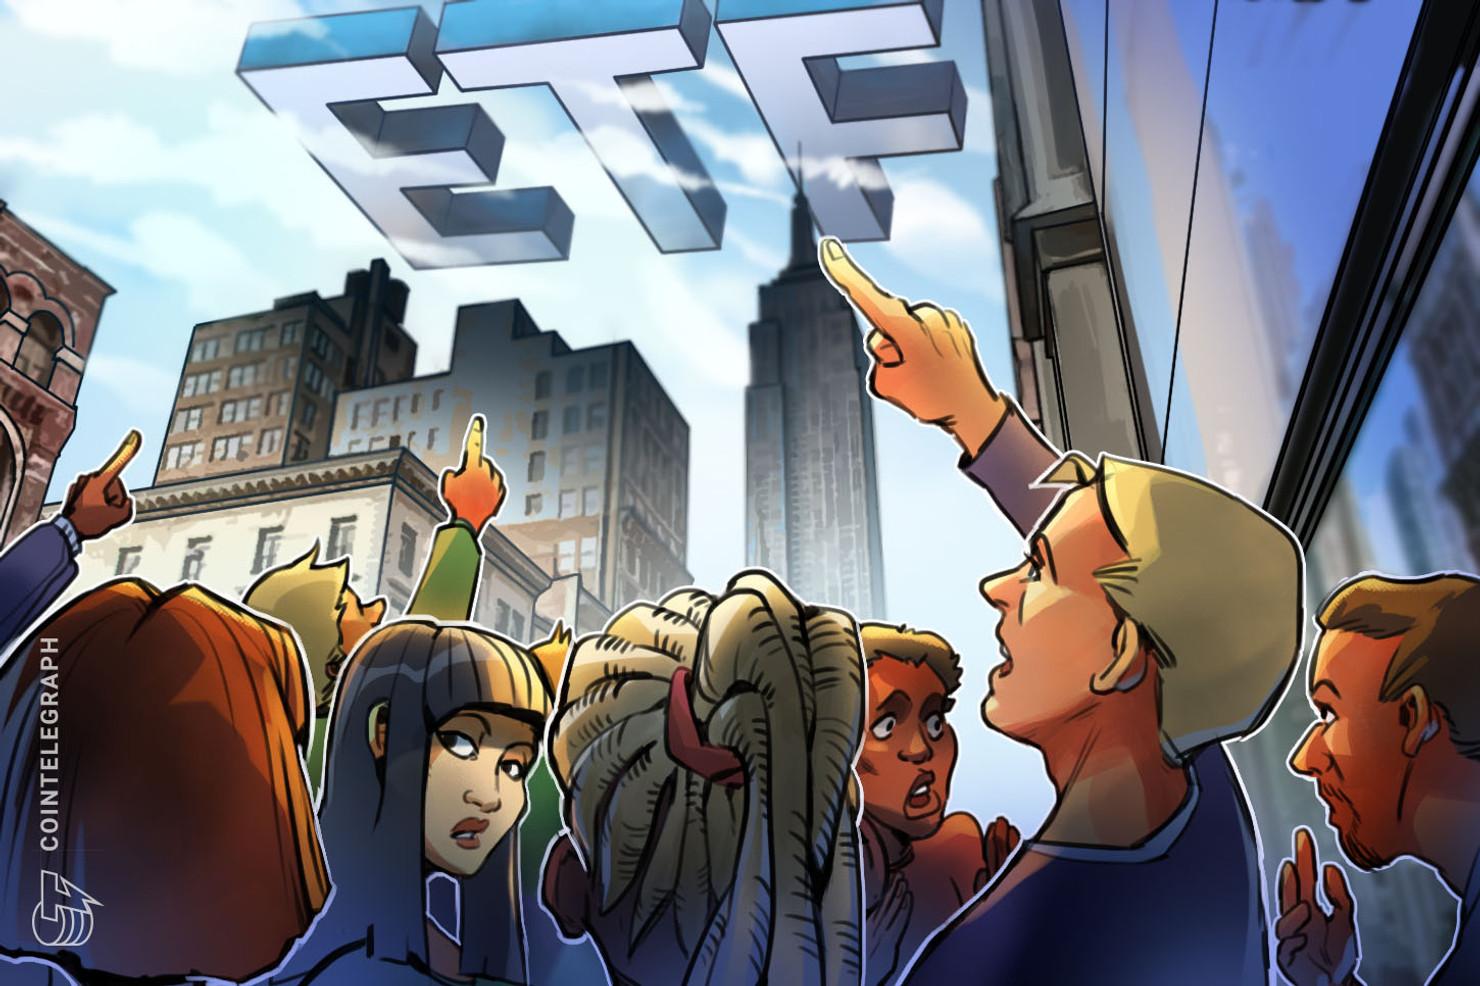 US SEC Delays Decision on Bitwise Bitcoin ETF, Seeks Public Comment